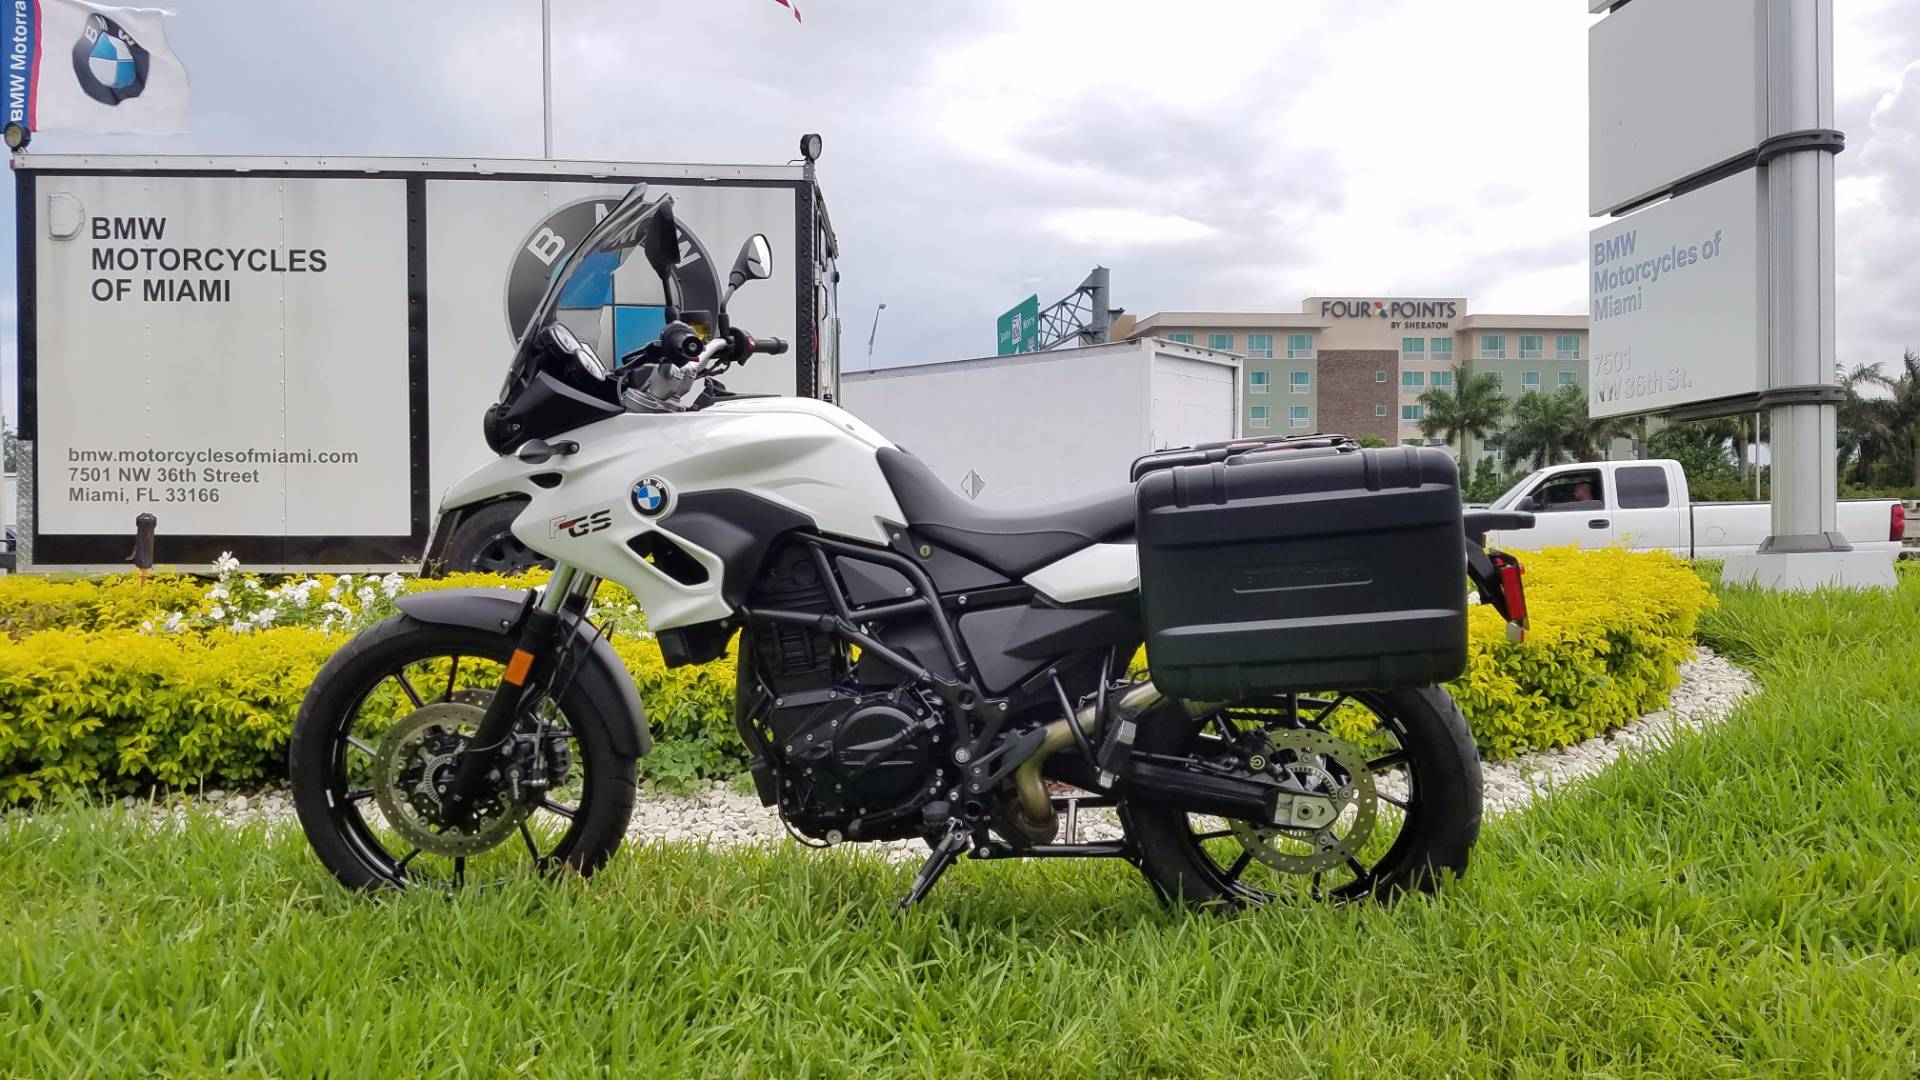 2015 F 700 GS